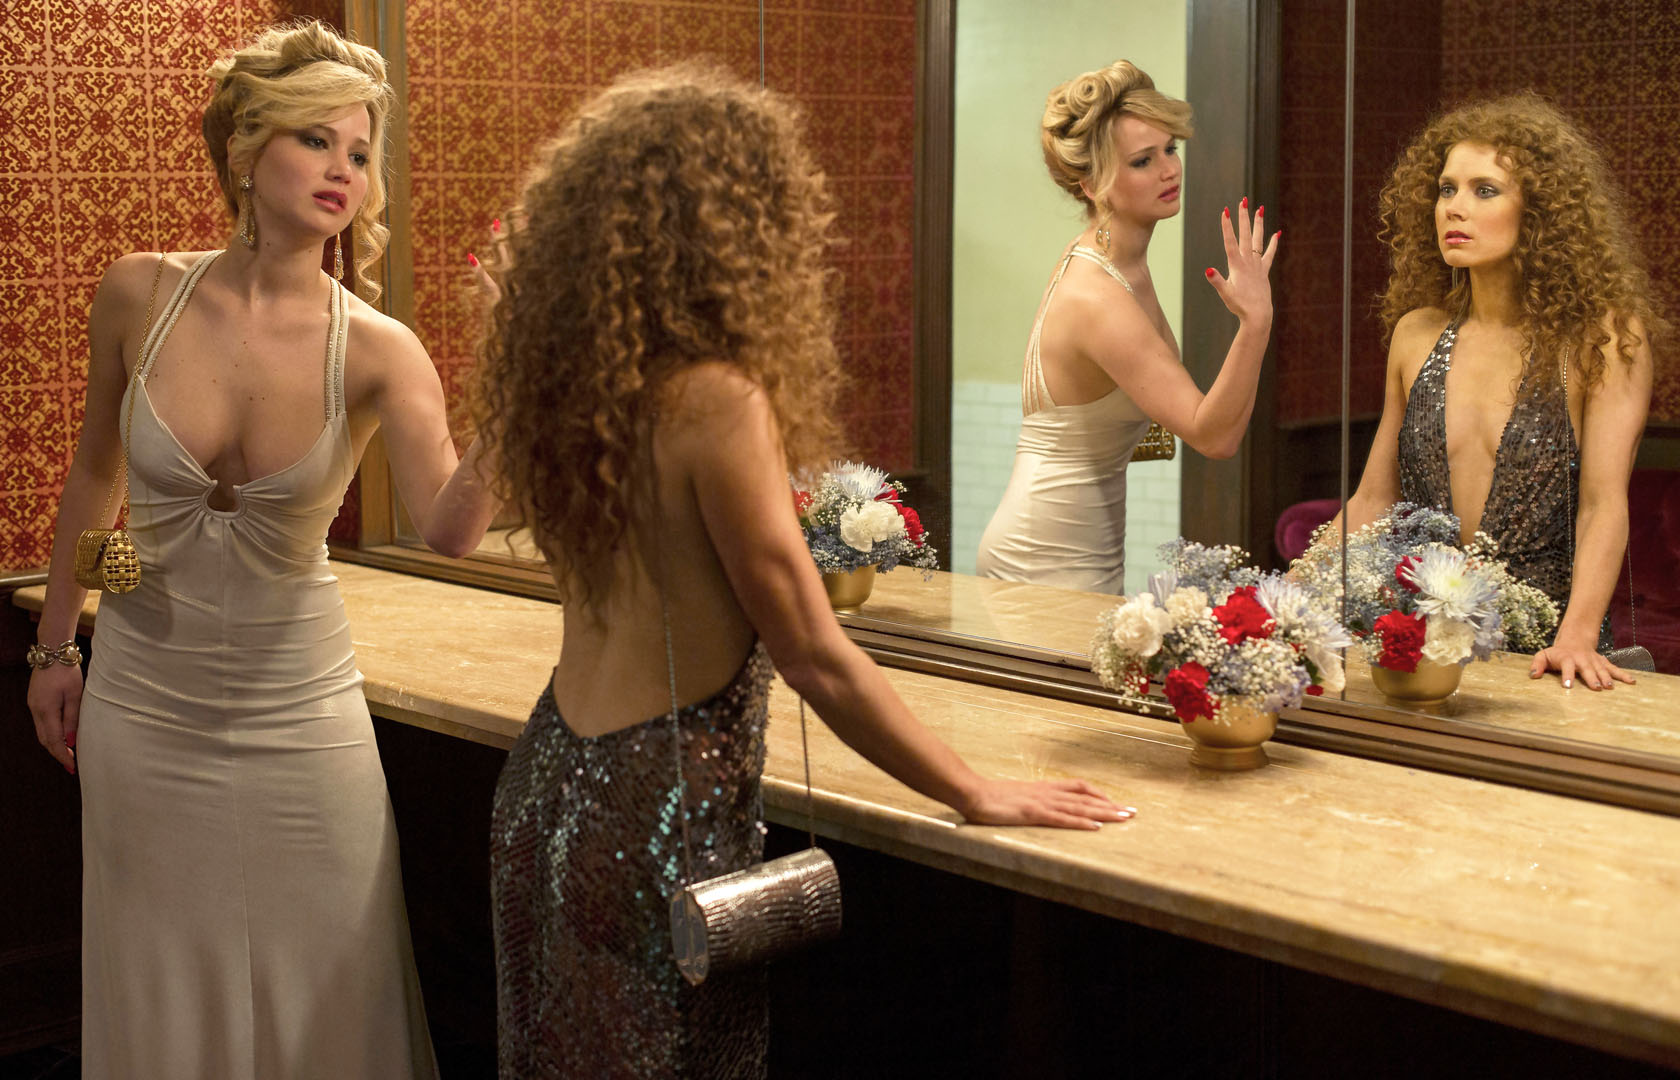 Case Design walter white phone case : Jennifer Lawrence 4 Hot Wallpapers -03 - GotCeleb